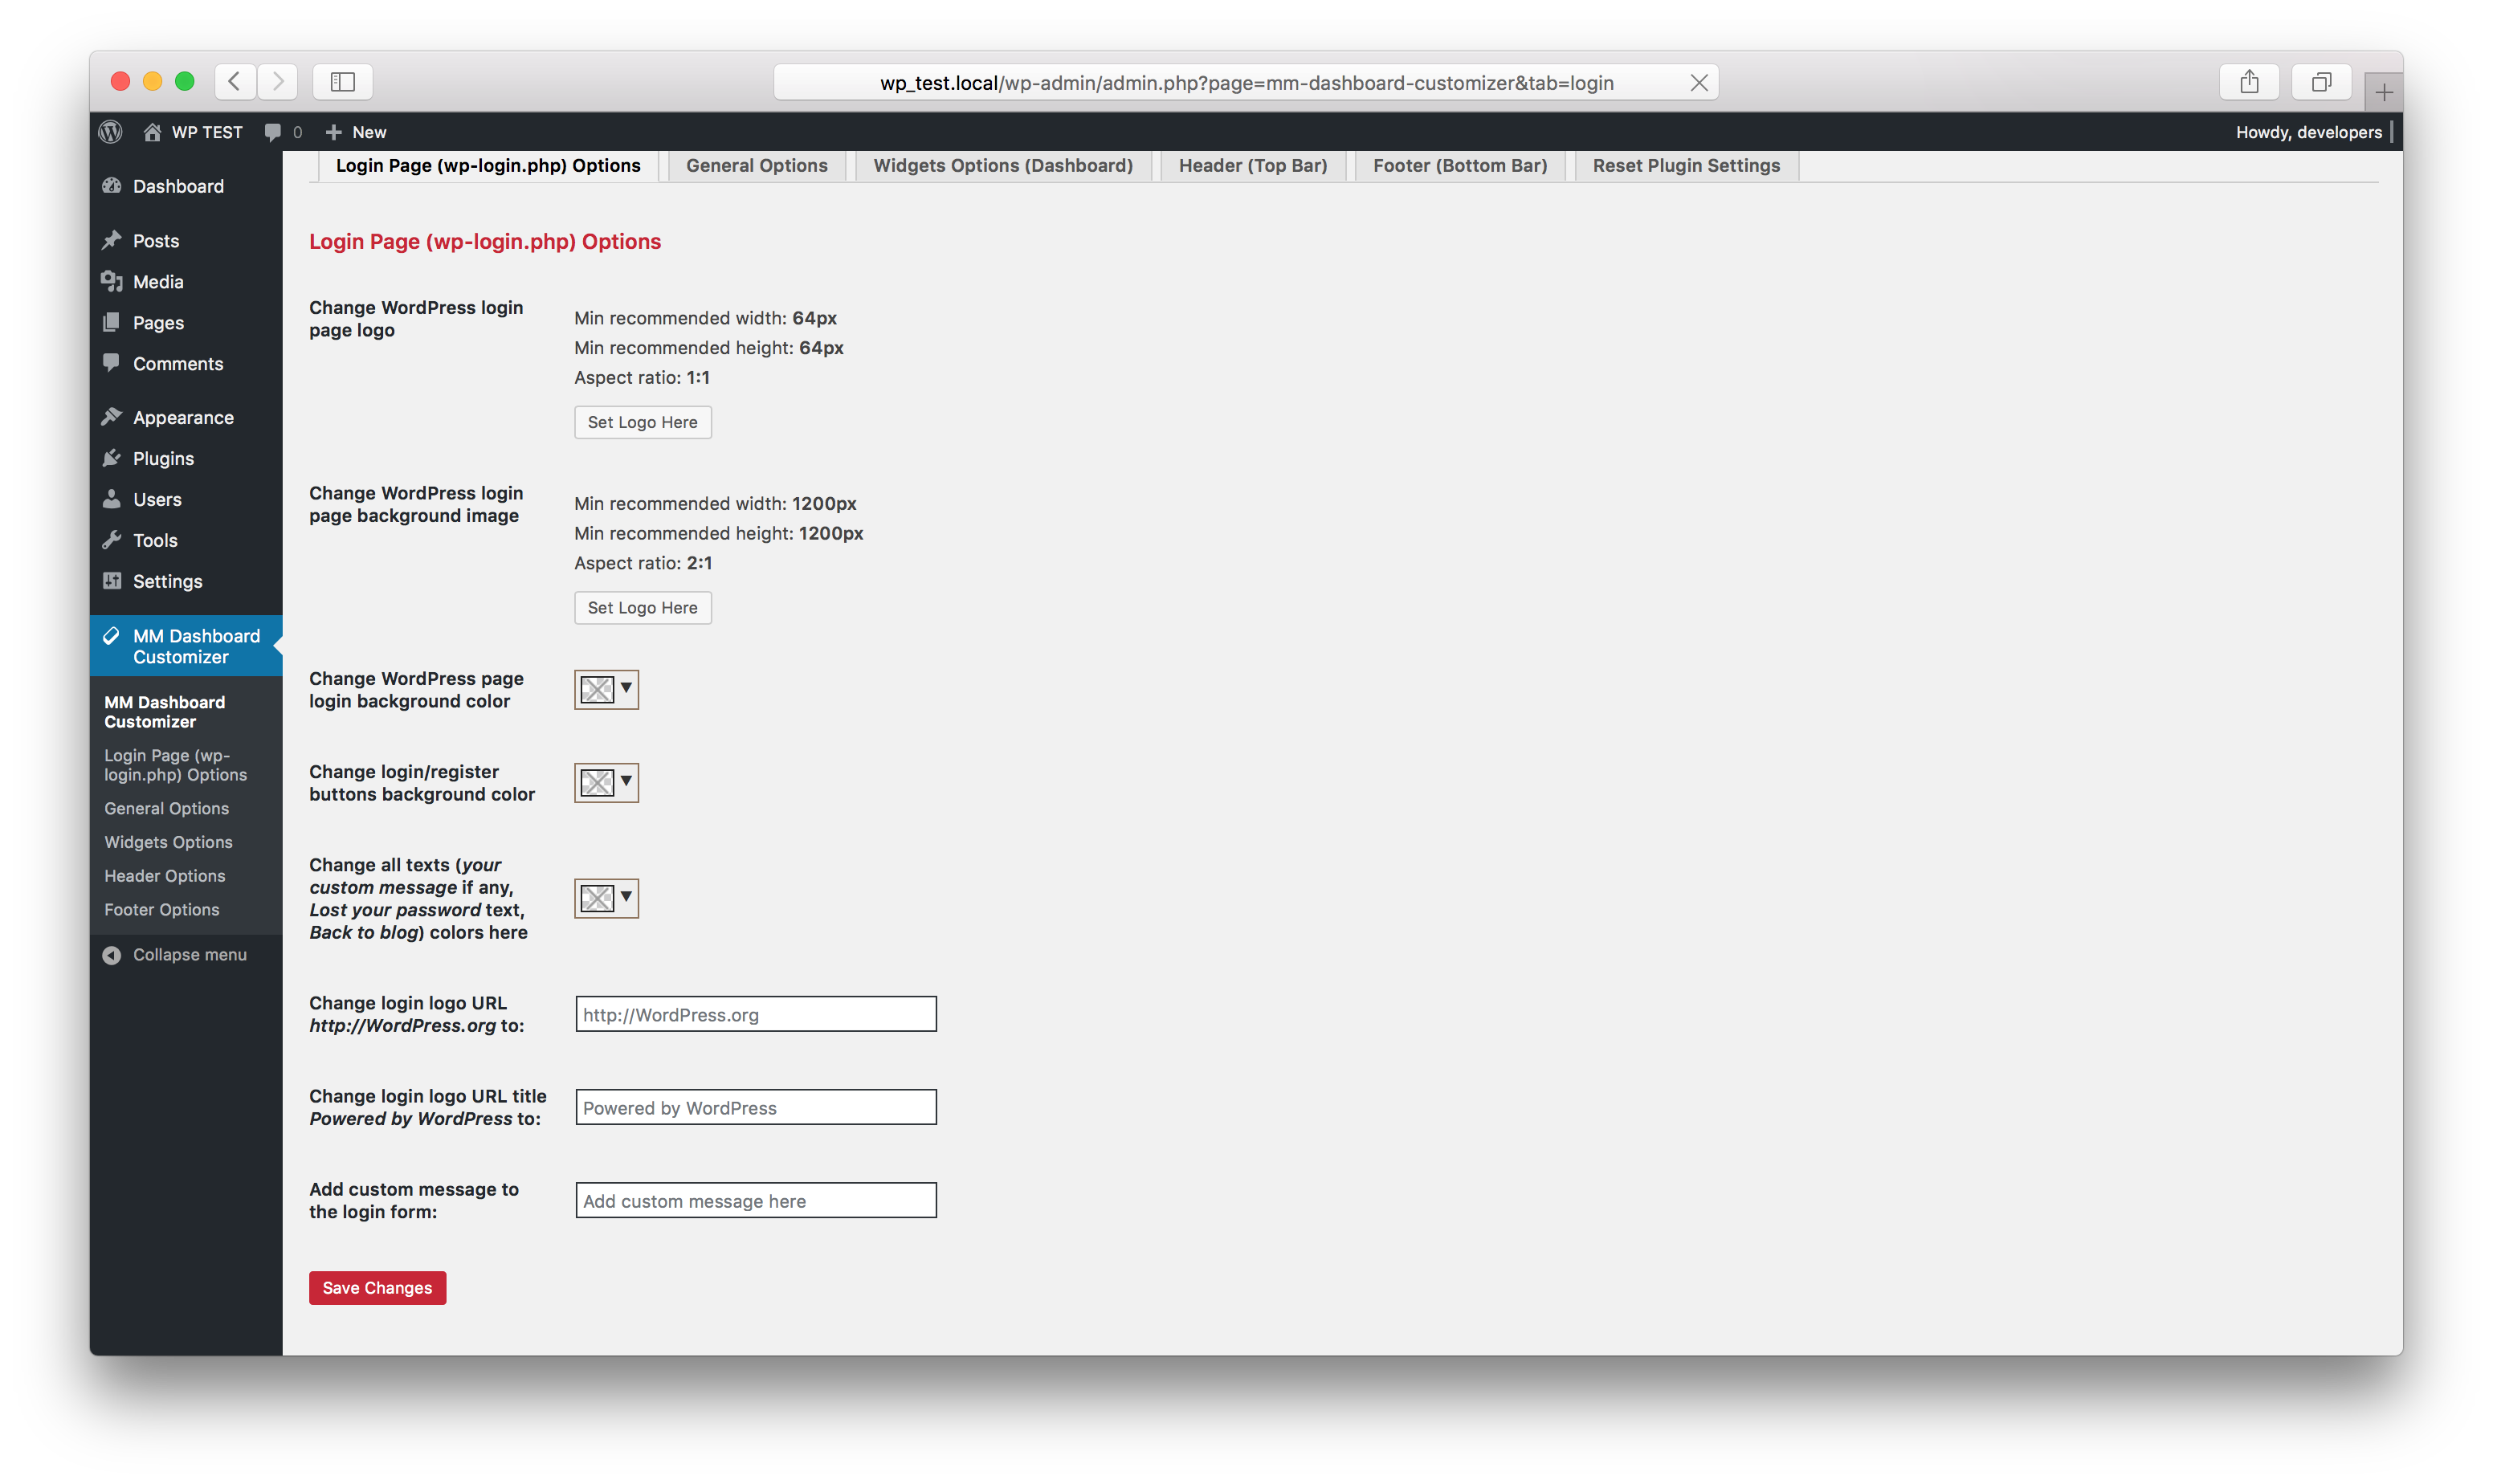 Plugin login page options